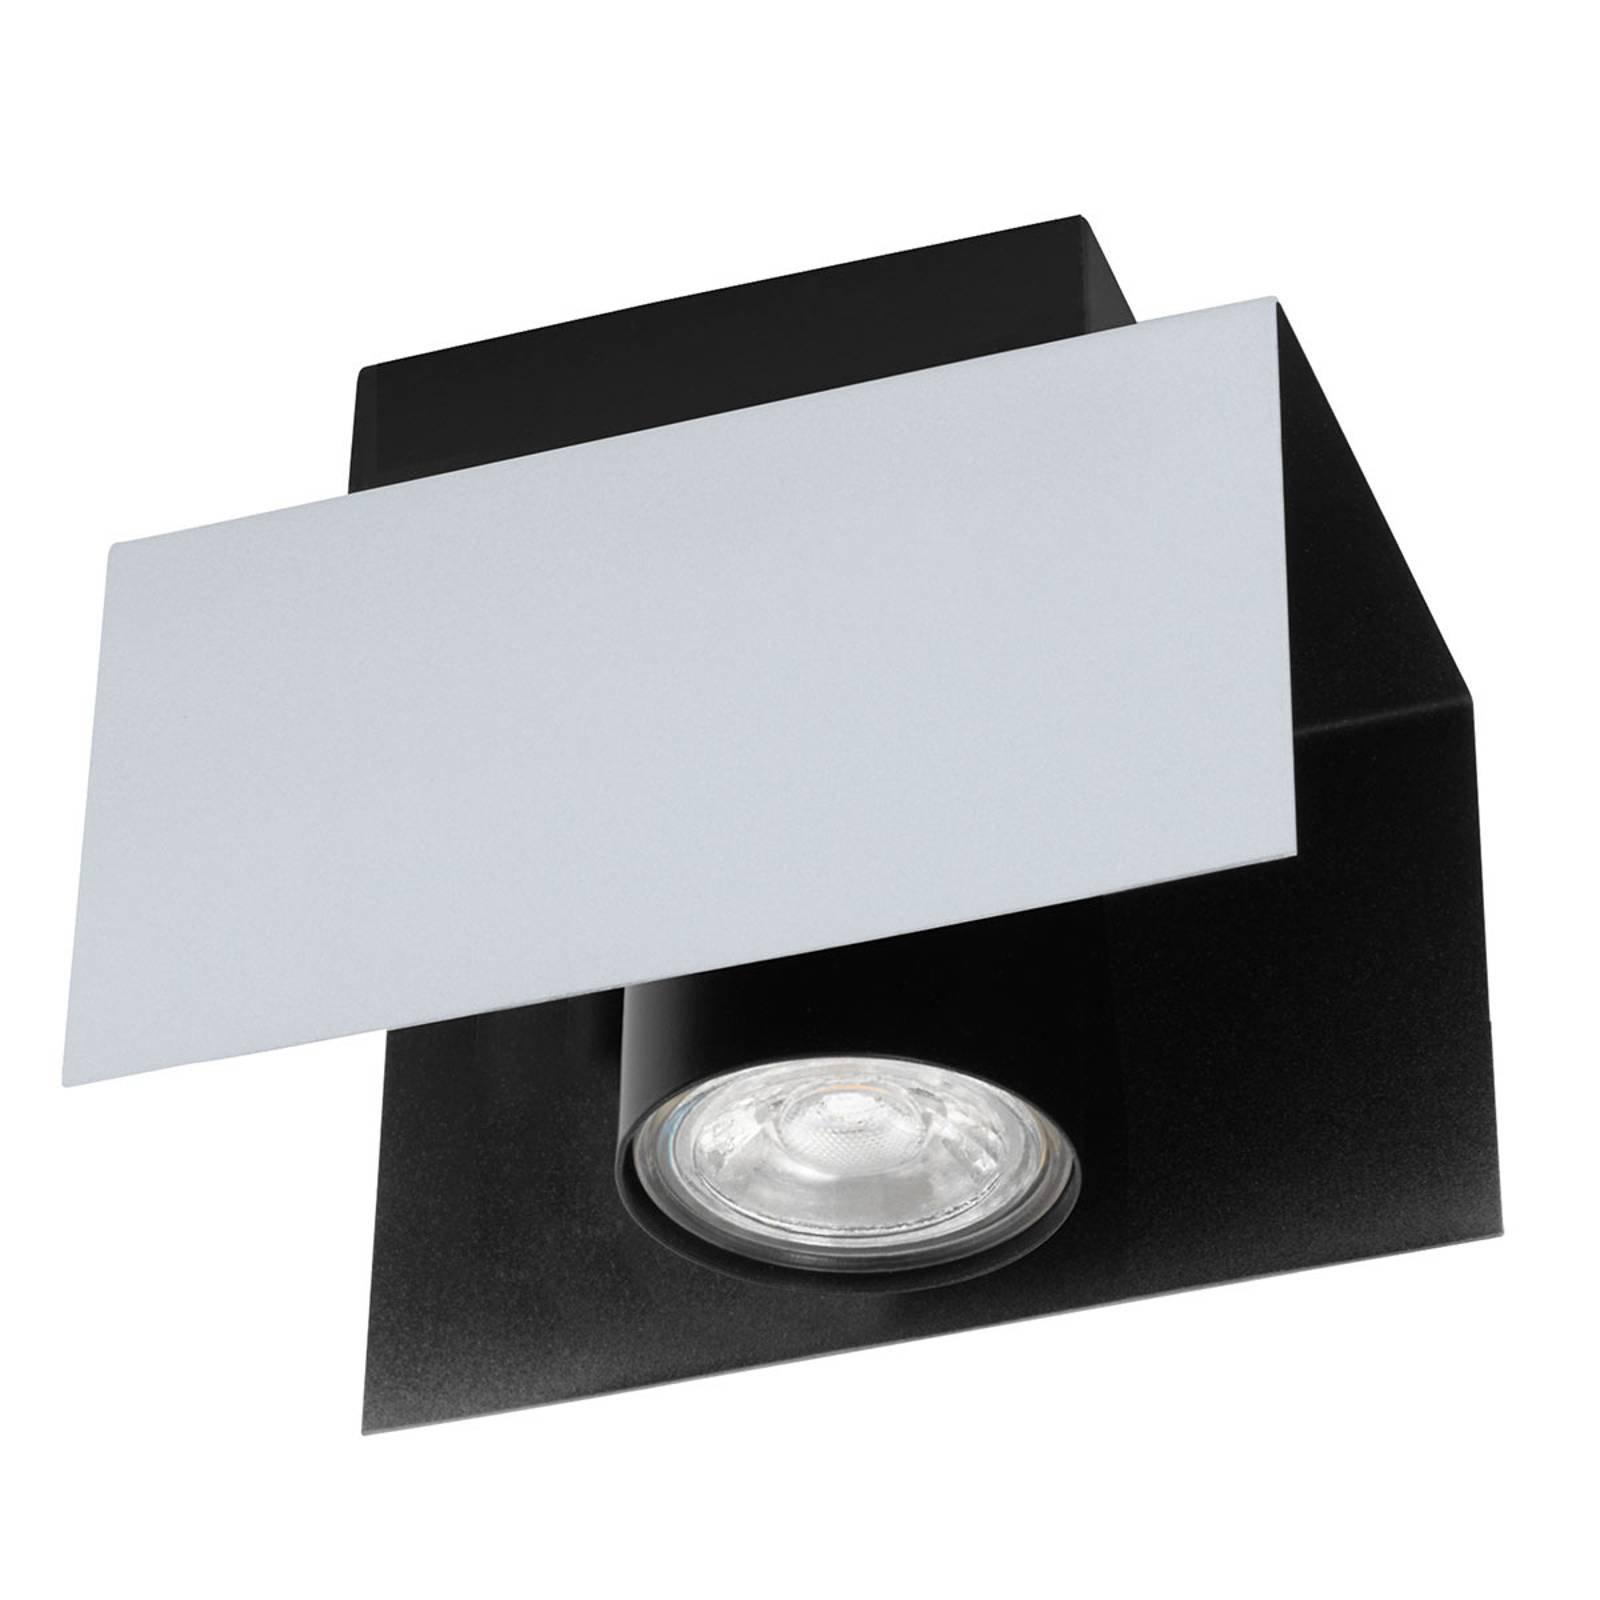 LED-taklampe Viserba 12 cm